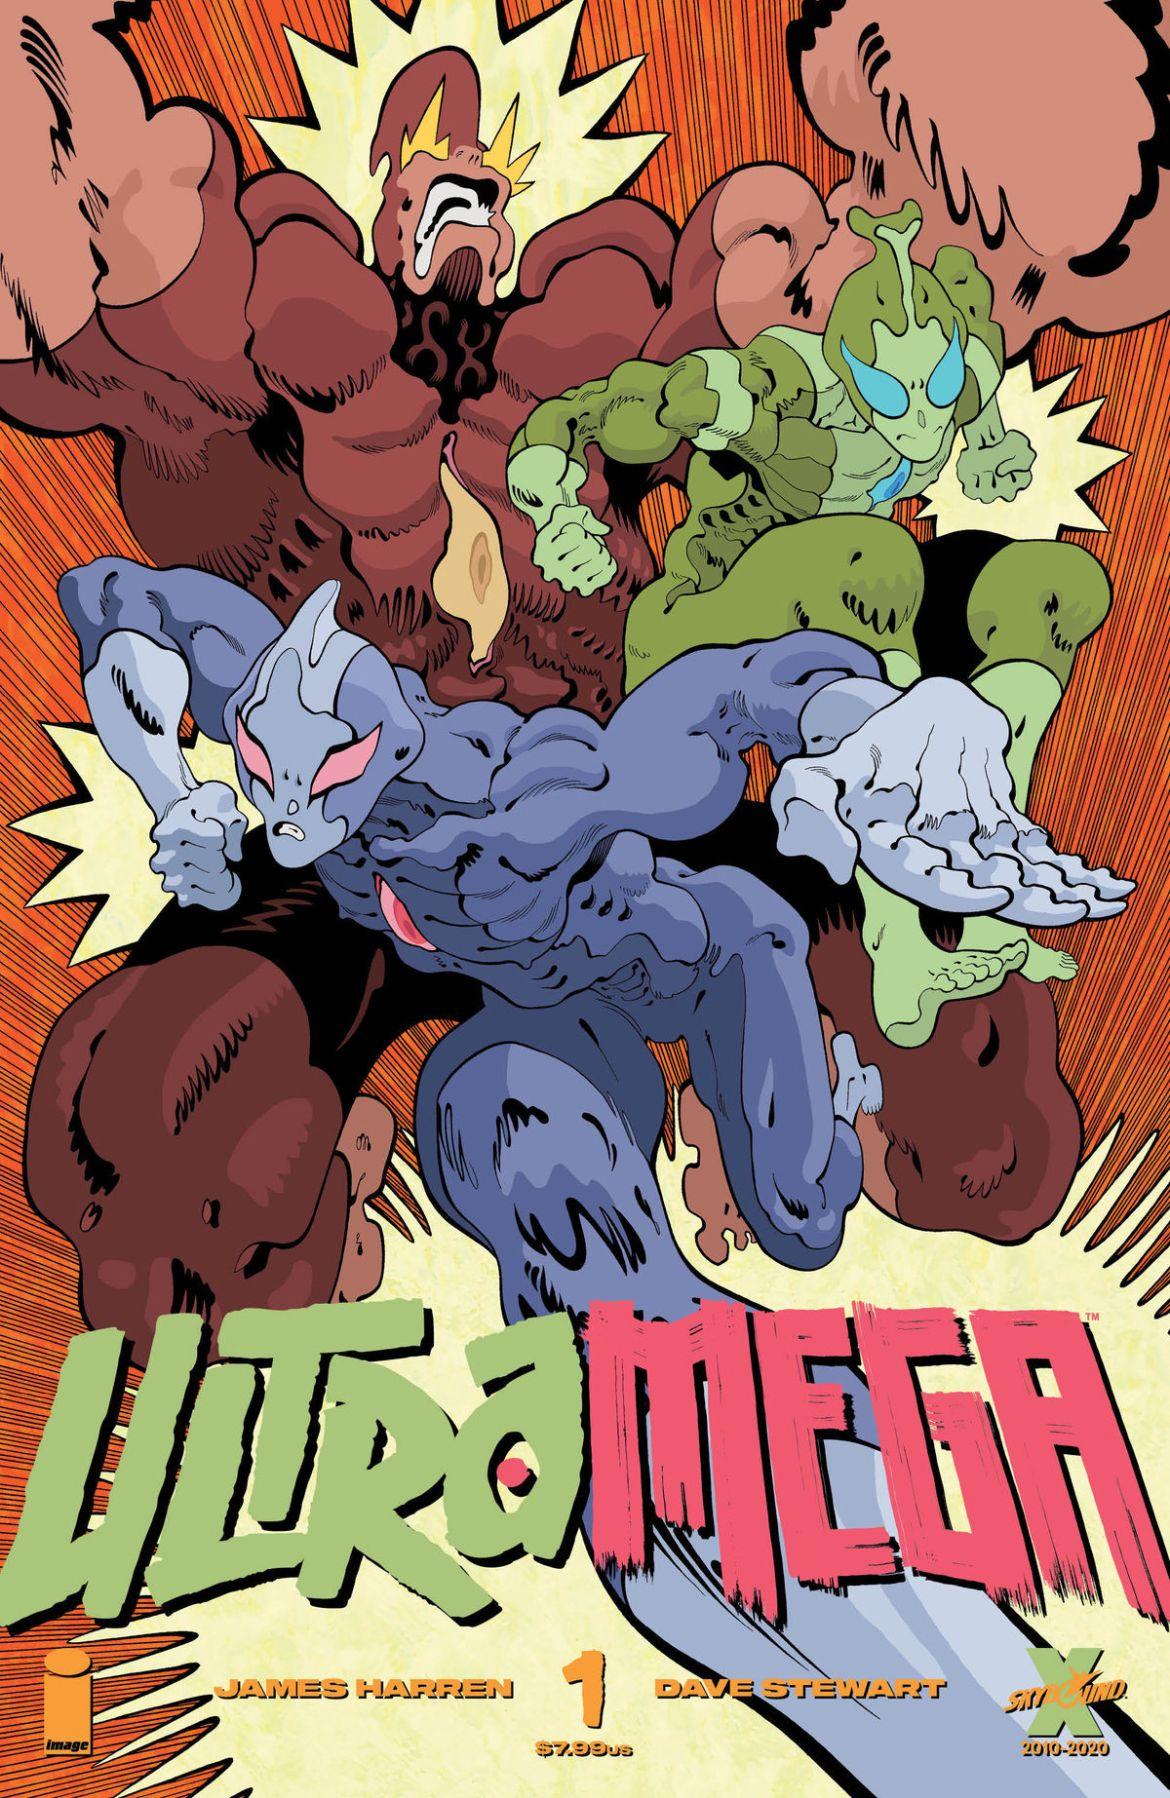 Ultramega01B_TraddMooreCover_2021-02-05-180715_c6815a0147f8285e3b5042ebb3626151 ComicList: Image Comics New Releases for 03/17/2021